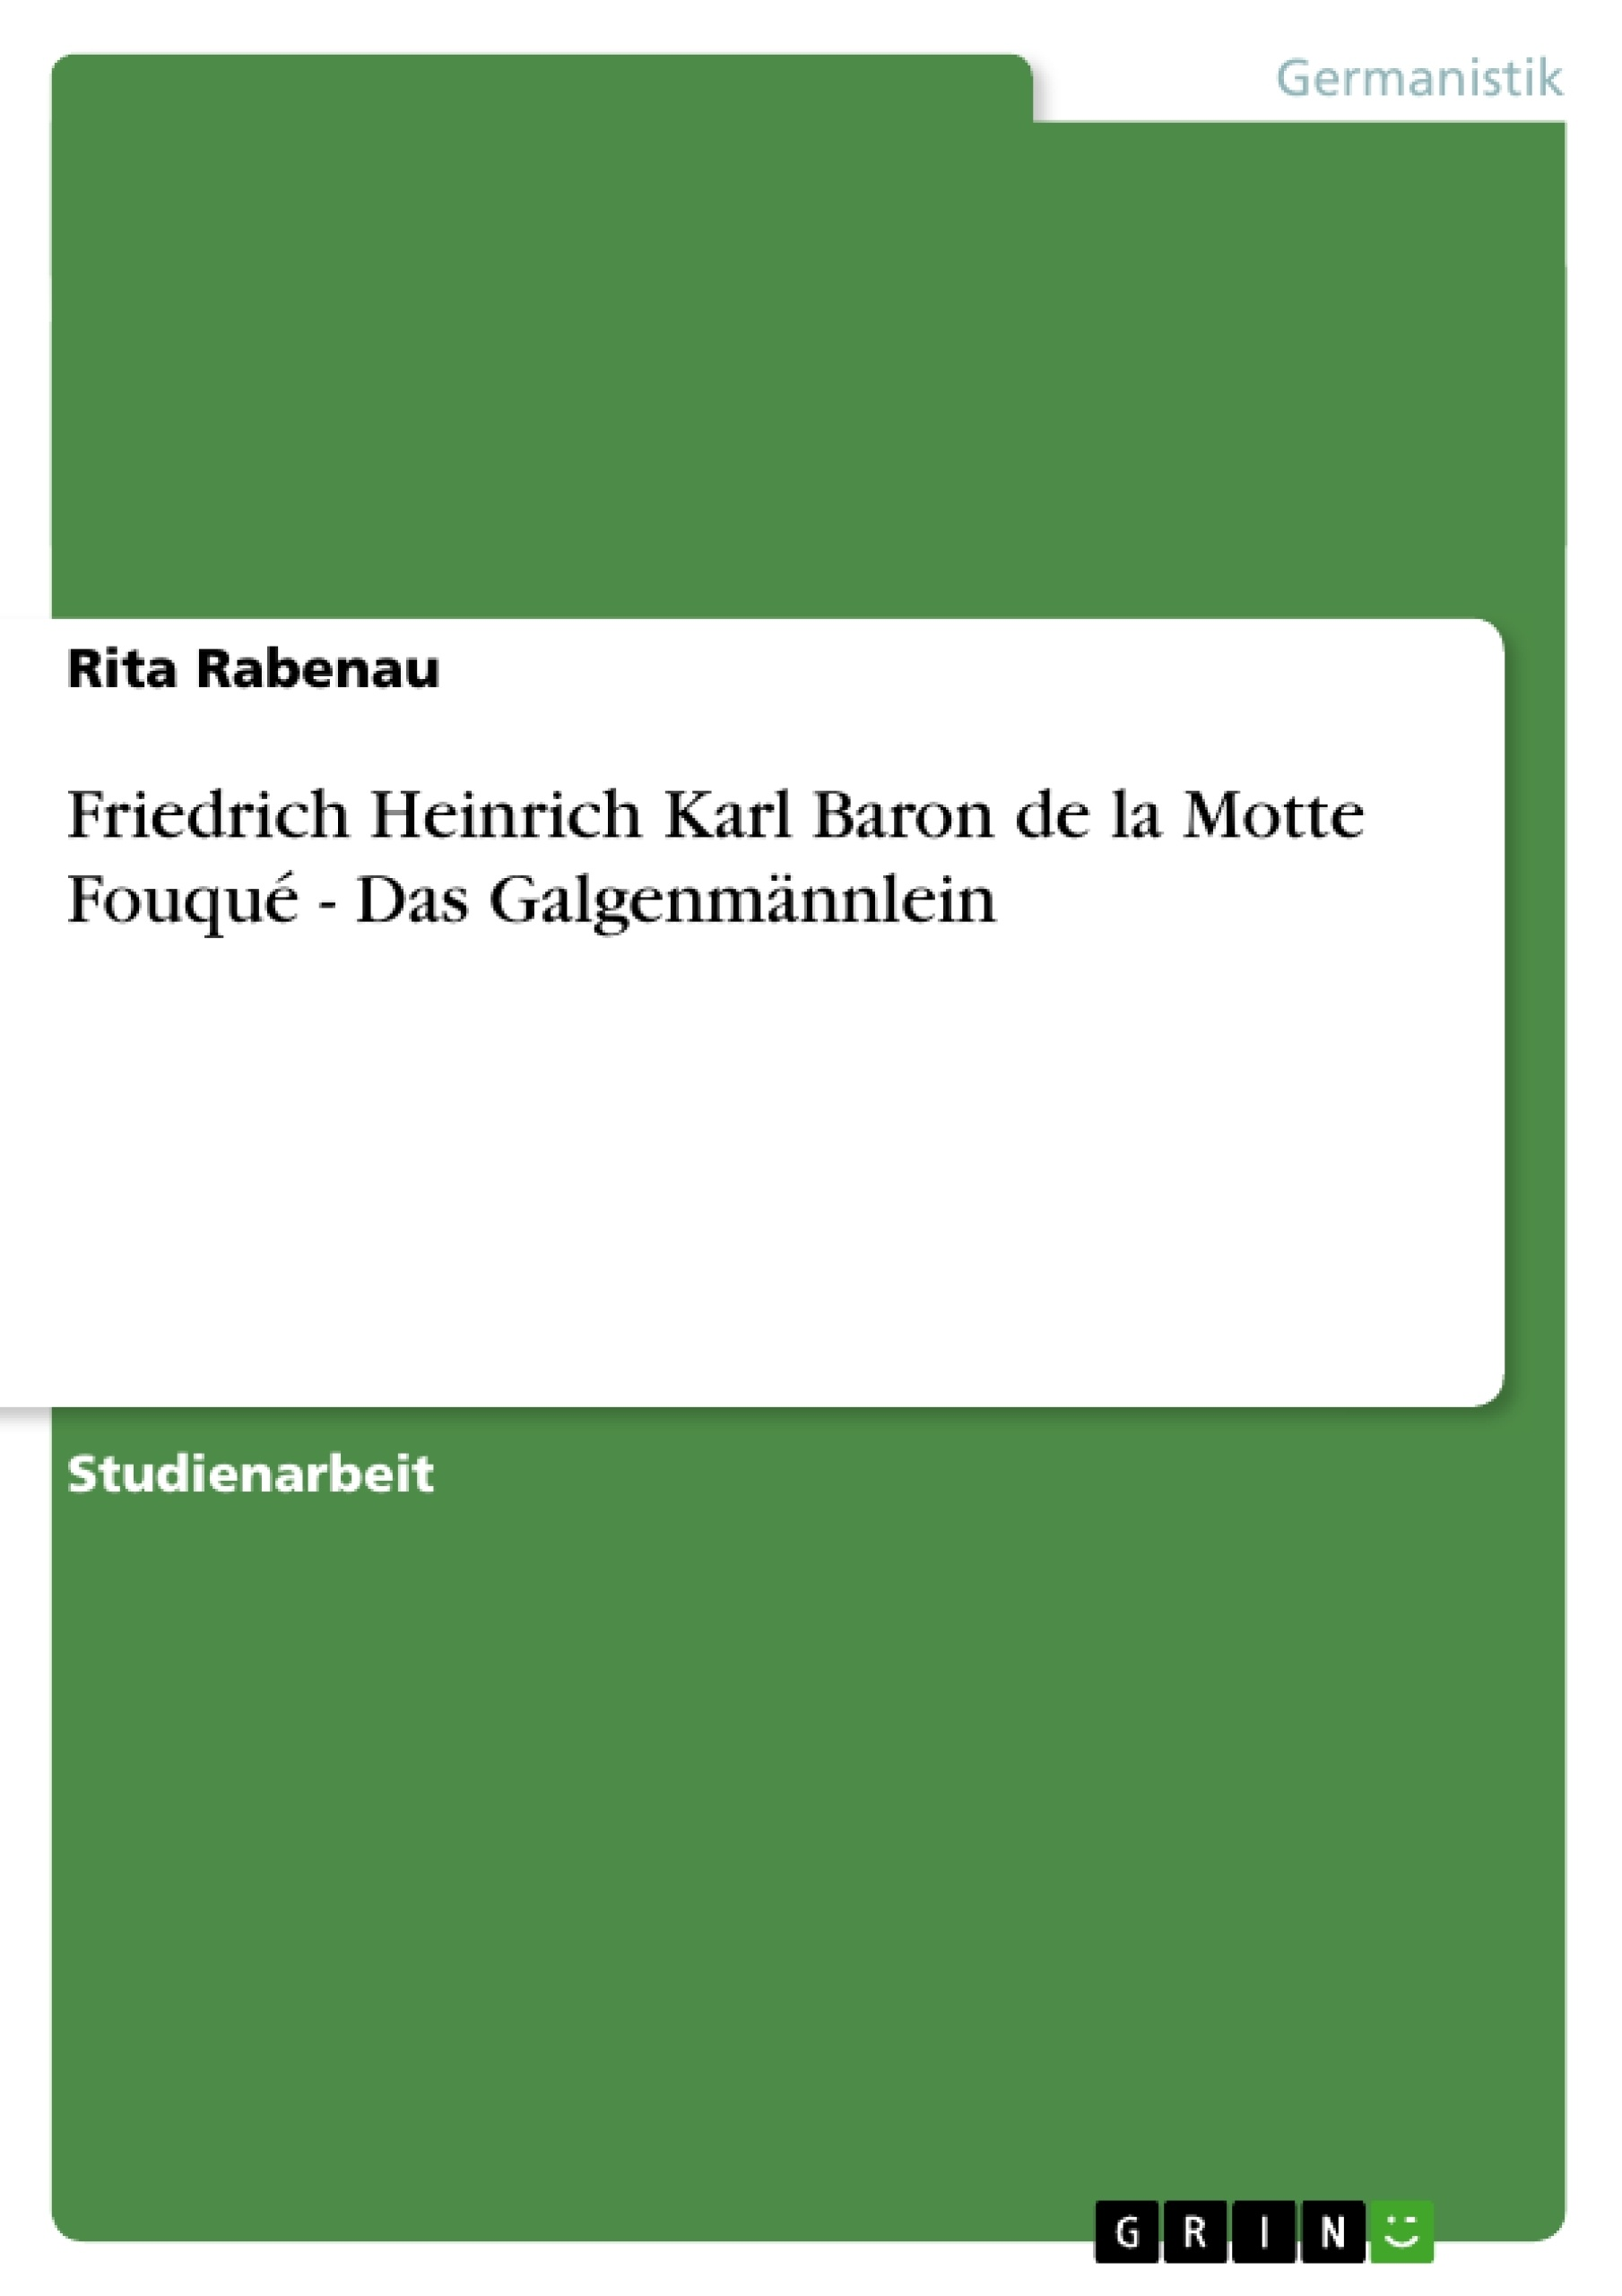 Titel: Friedrich Heinrich Karl Baron de la Motte Fouqué - Das Galgenmännlein